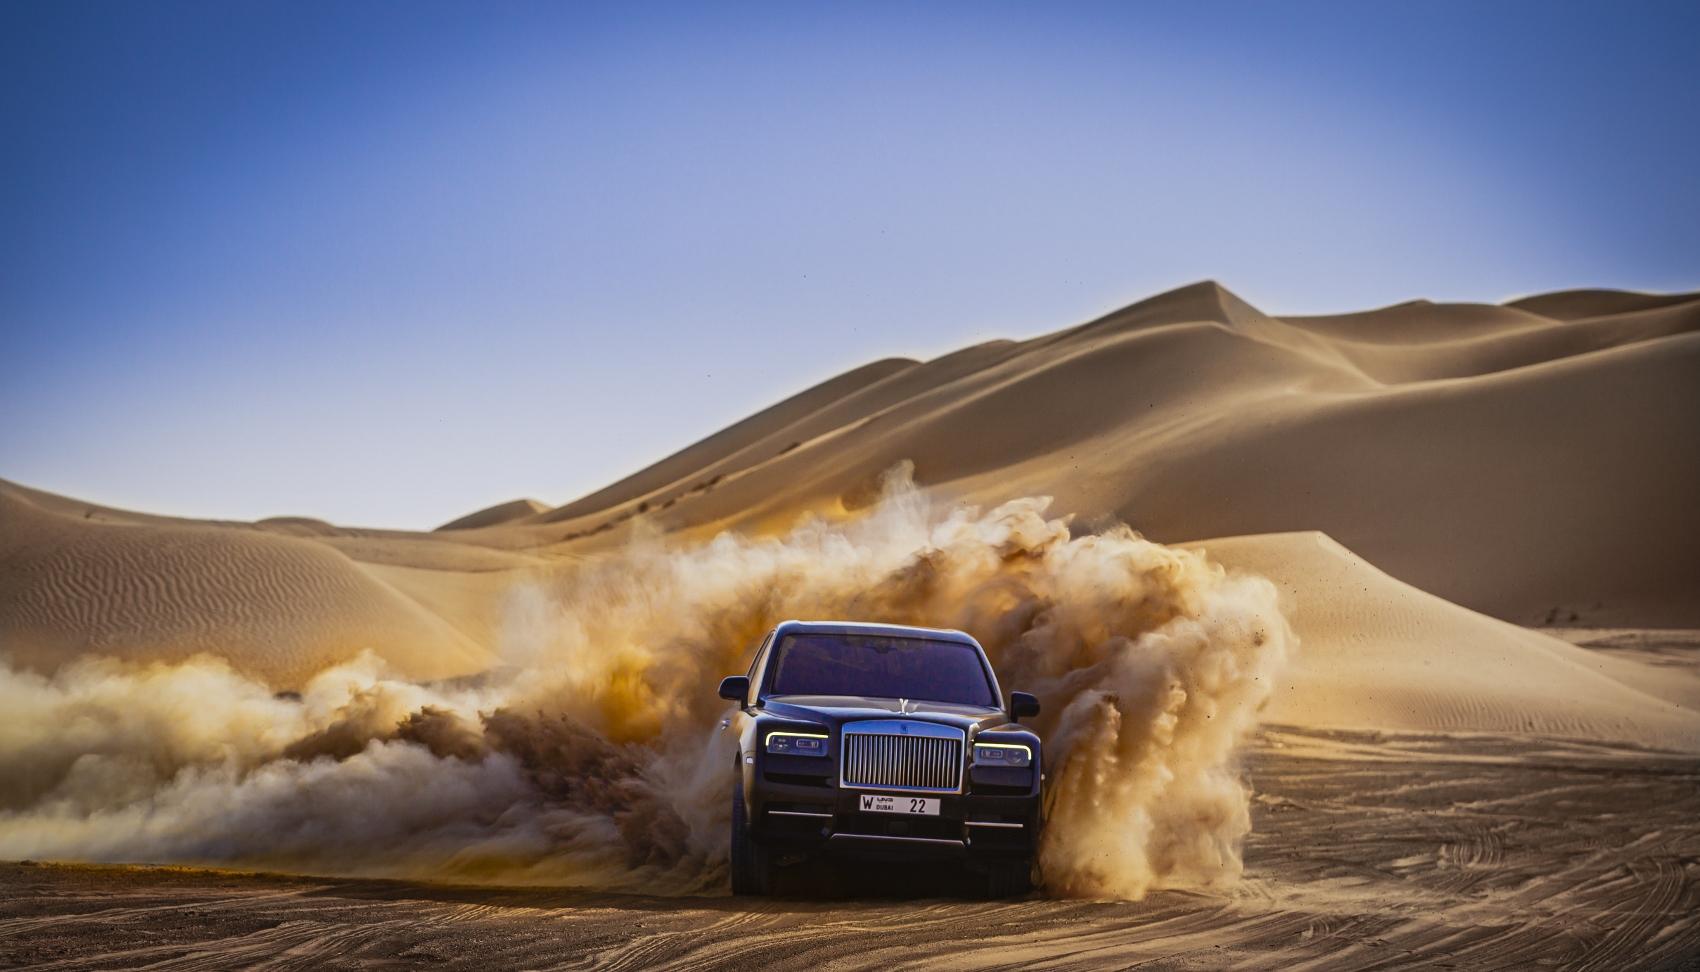 Rolls Royce Cullinan sa predviedol na púšti. Pozrite si foto aj video jXqF27ogxE rolls-royce-cullina